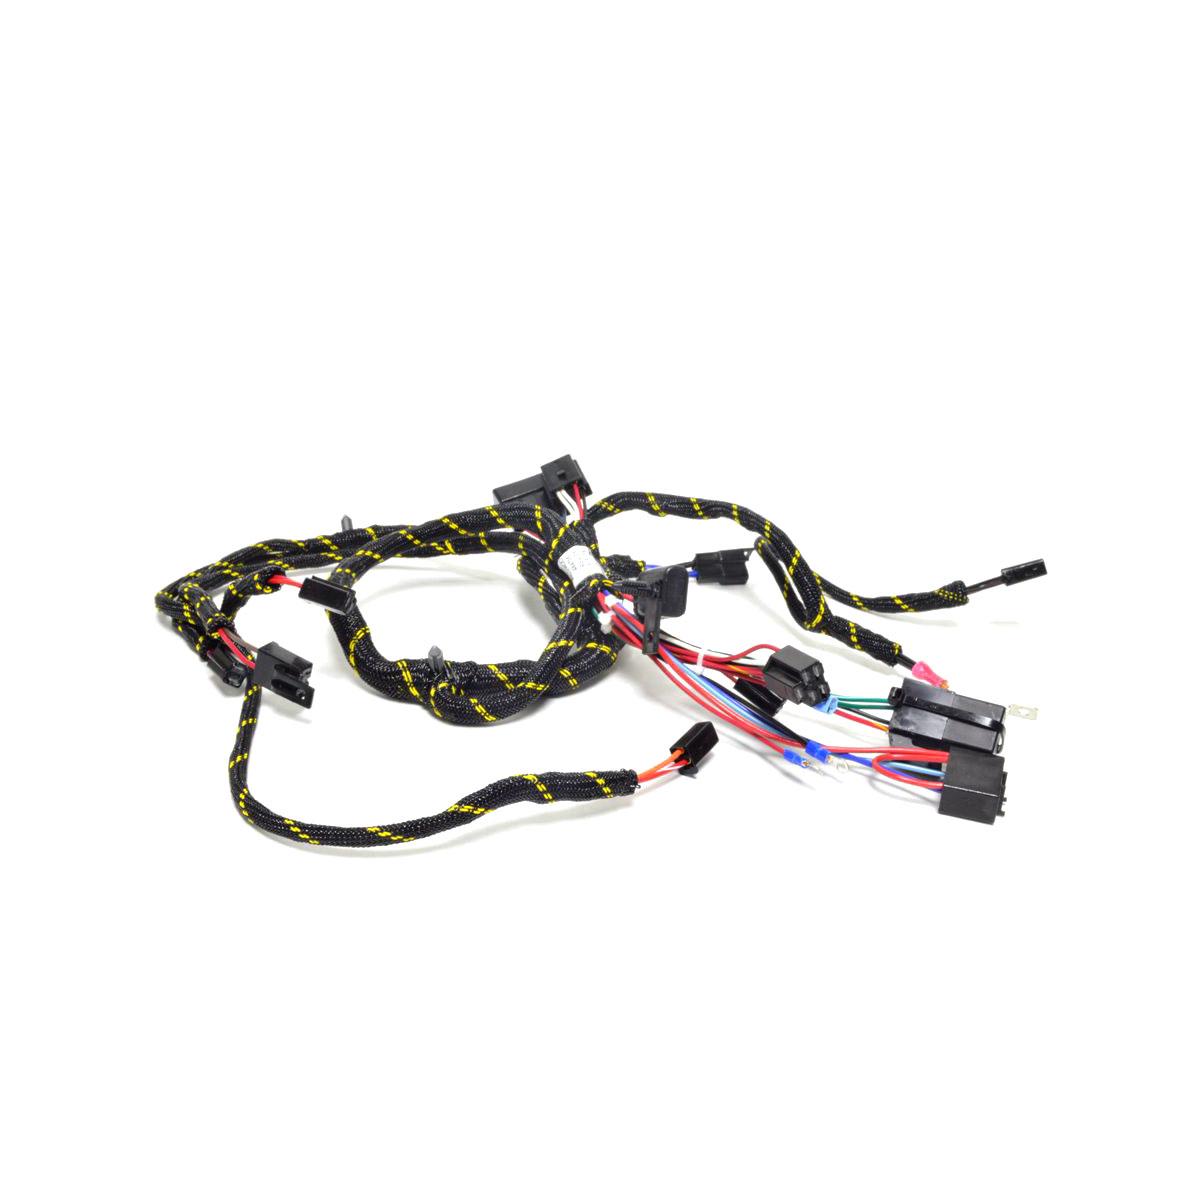 Scag Wire Harness Stc Cv Efi 484705 Wiring